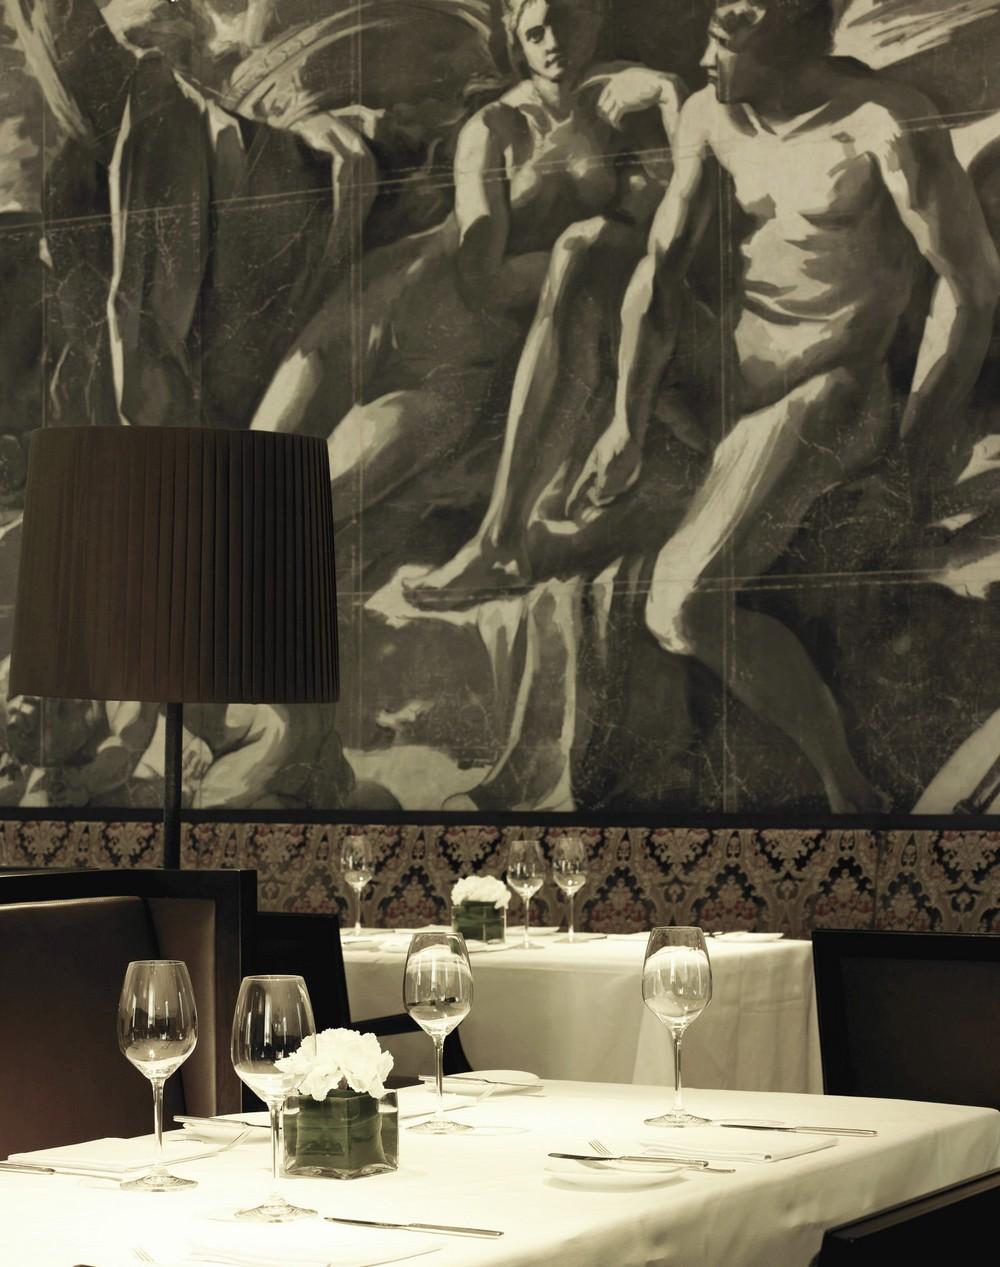 Interior Design The Art of Living à Française by Gilles & Boissier_6